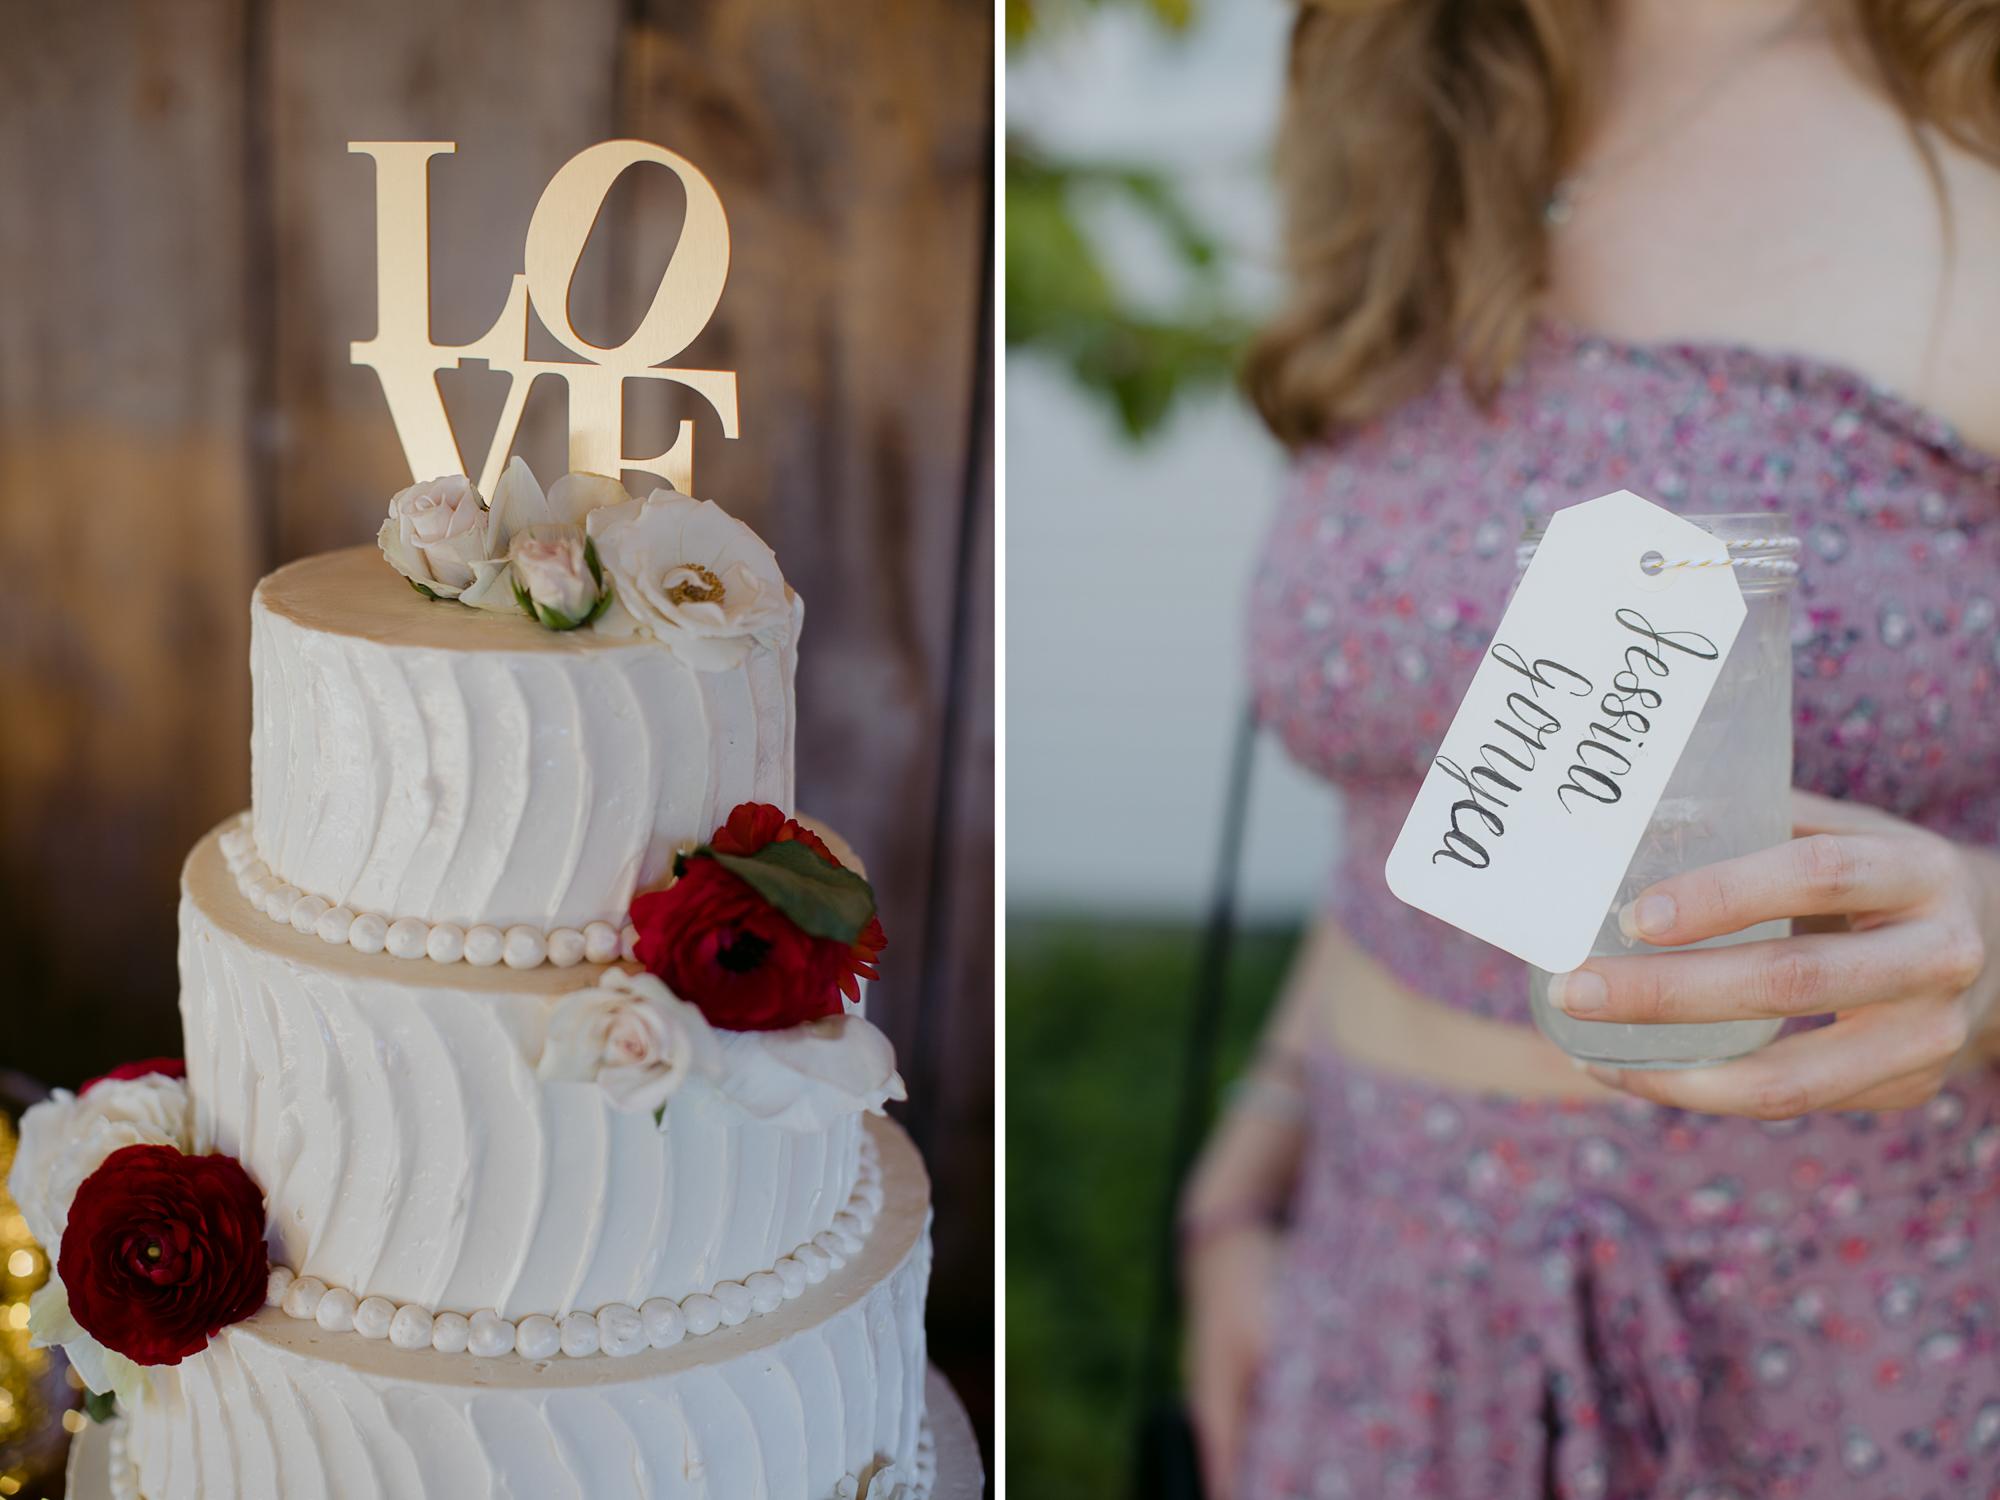 Livewell_Farm_wedding_Harpswell_maine_Meghan_Jim_019.jpg